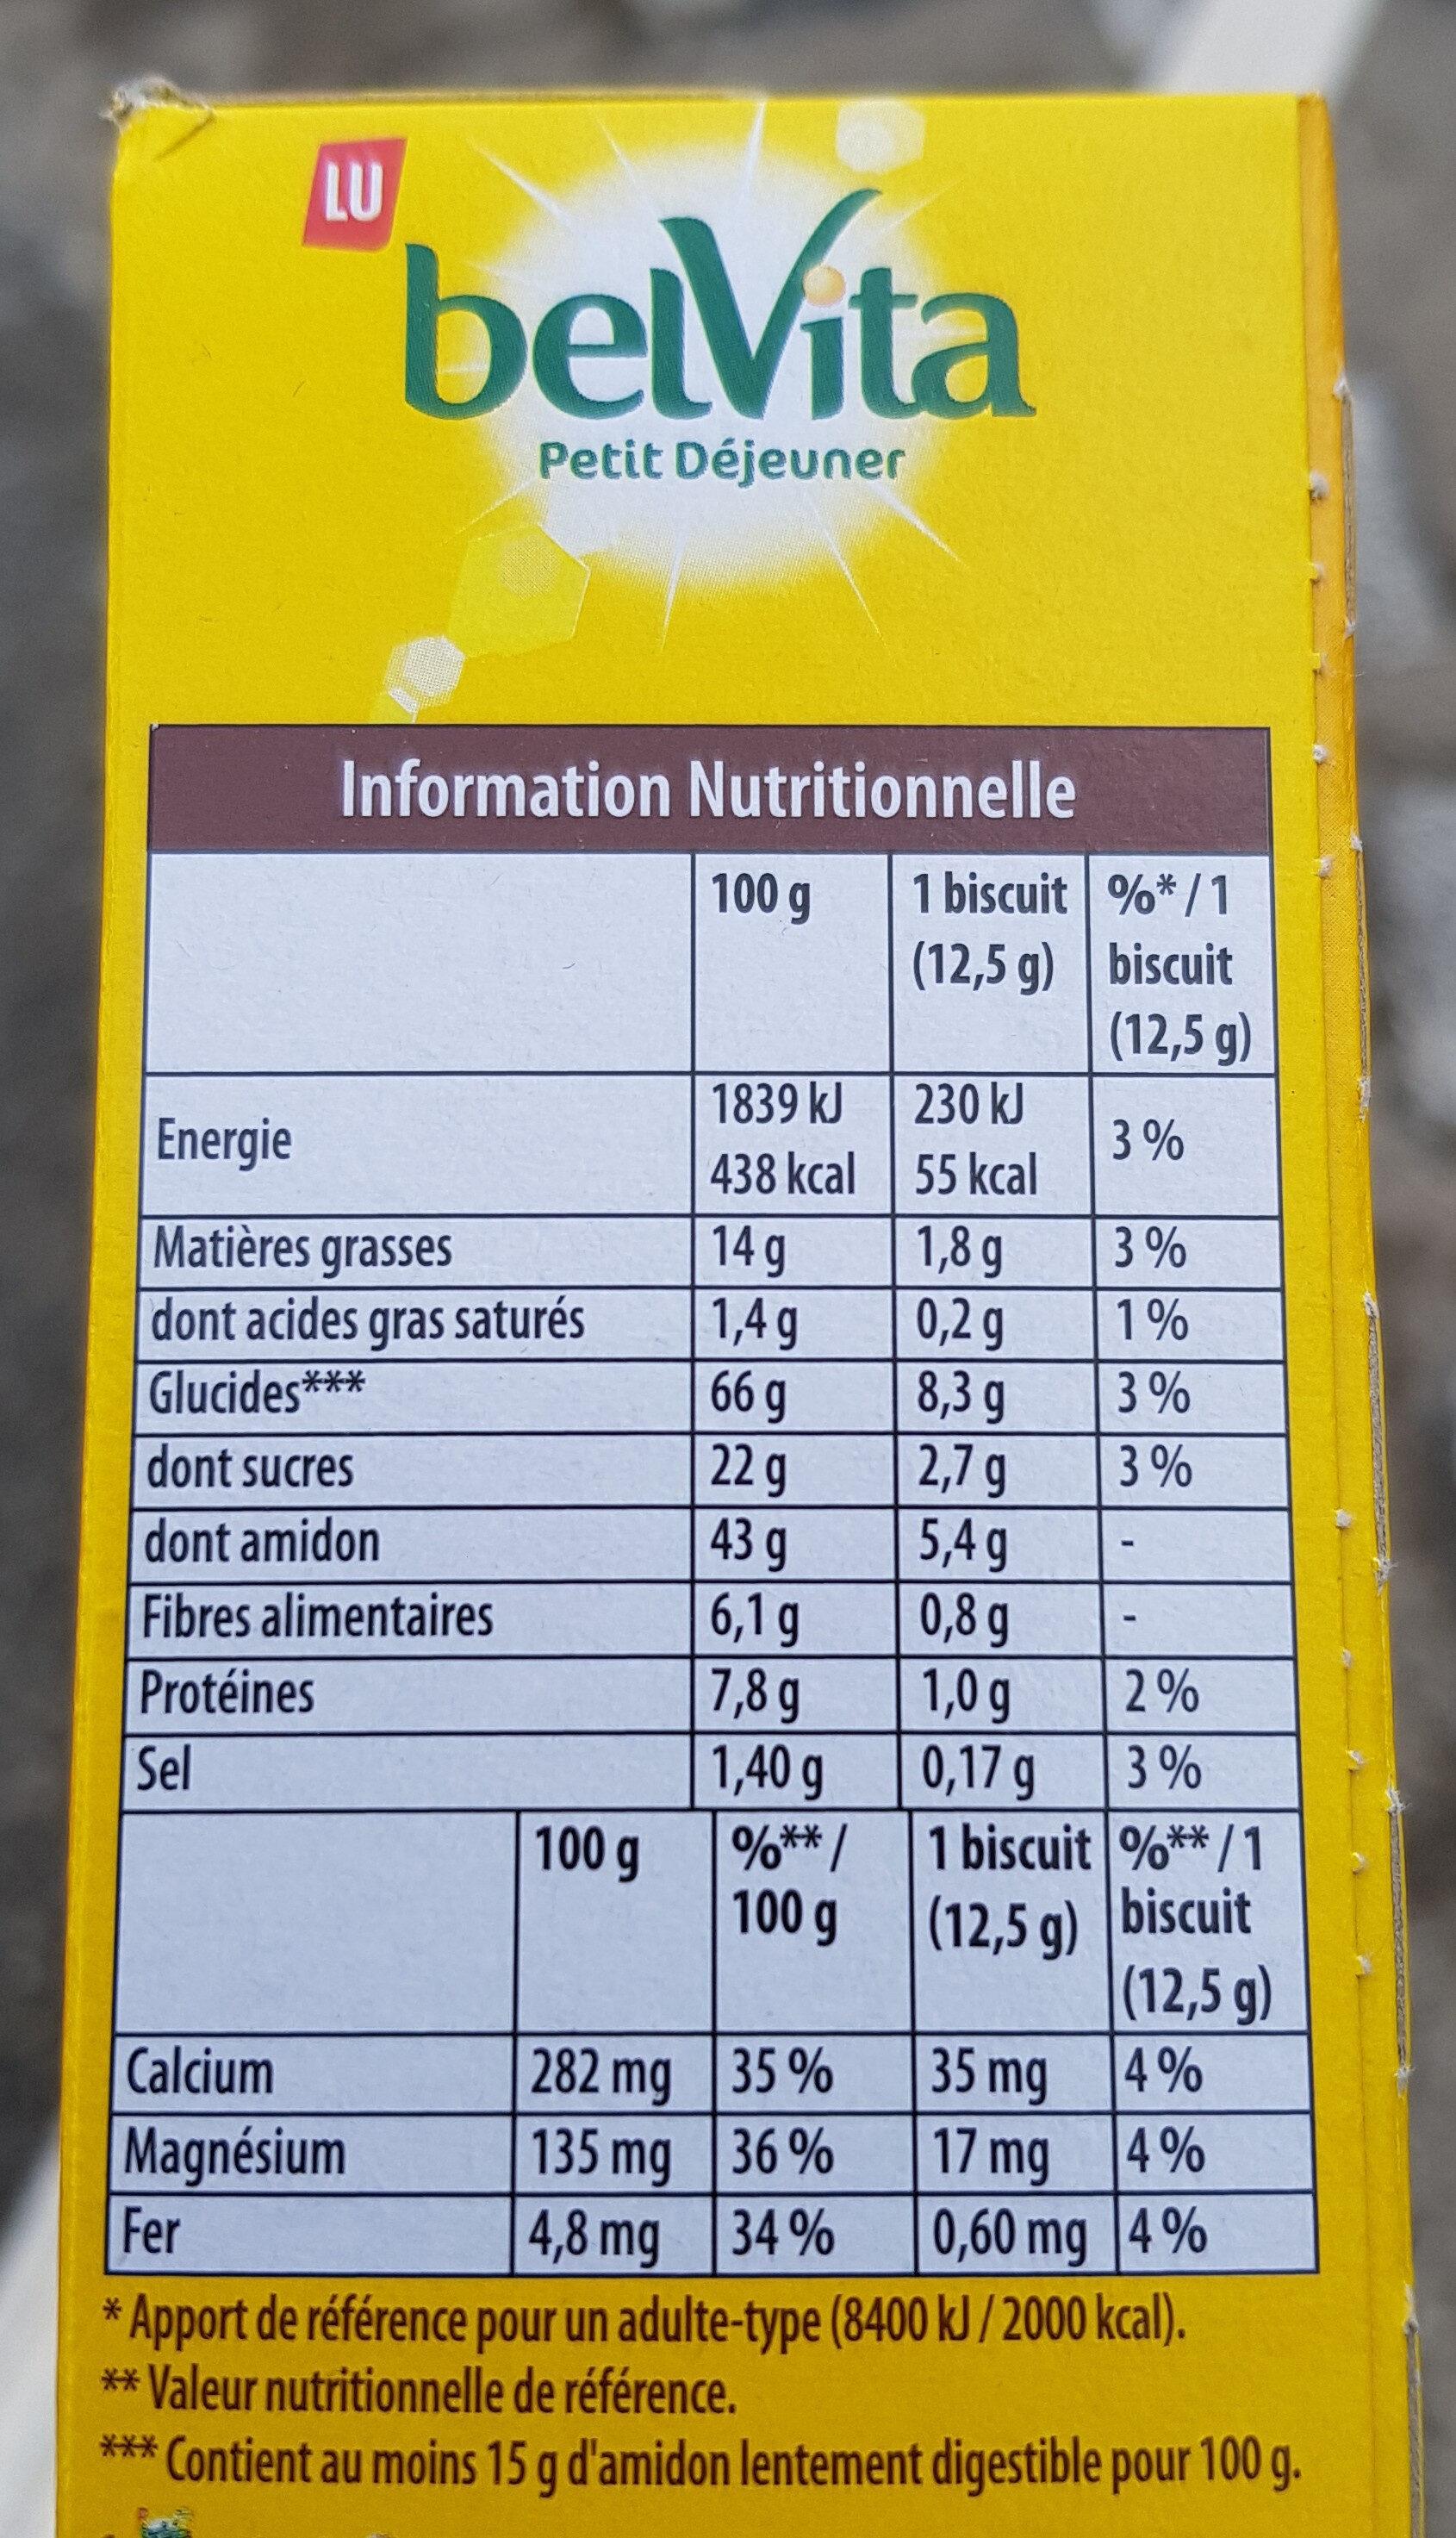 Belvita Petit-déjeuner Original - Nutrition facts